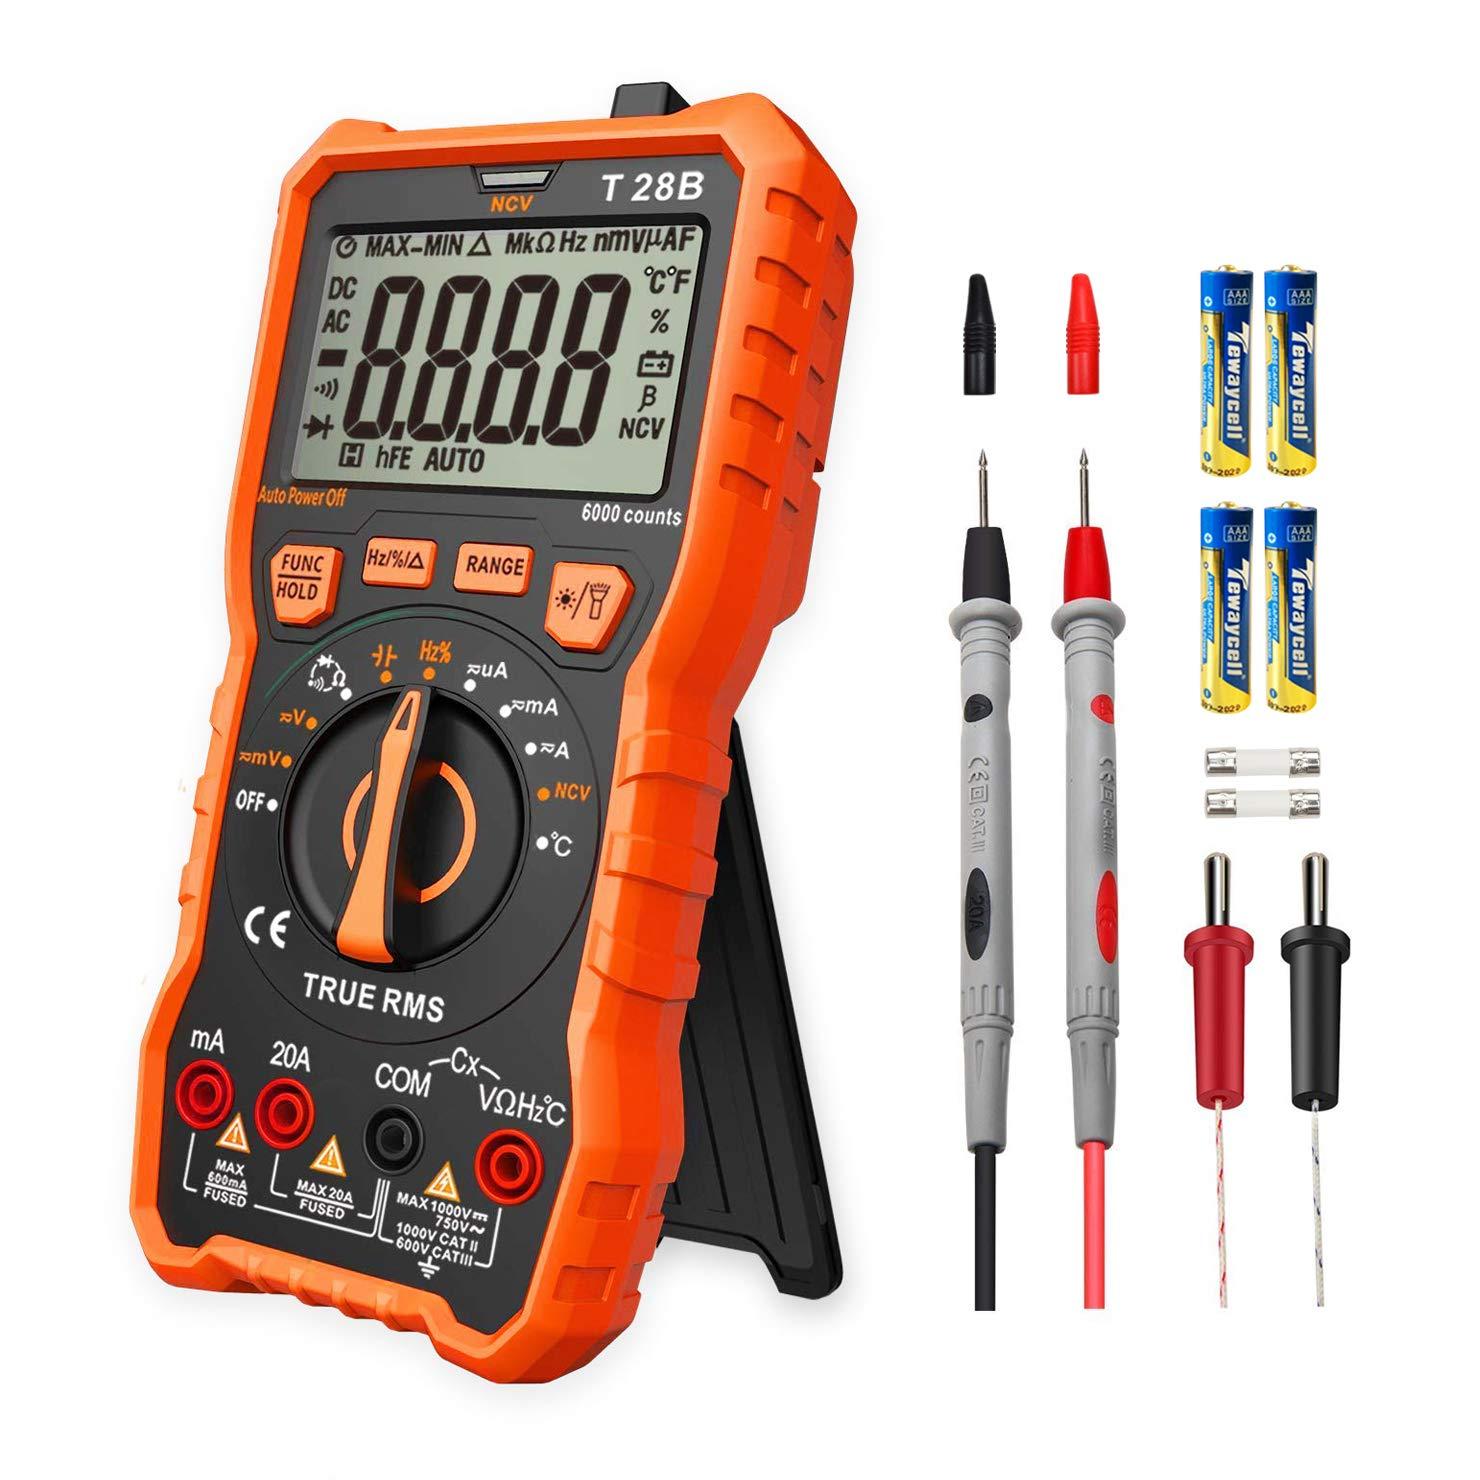 Multímetro Digital Profesional, LOMVUM T28B Automático Polimetro Digital 6000 Cuentas y 2000uF Tester Digital product